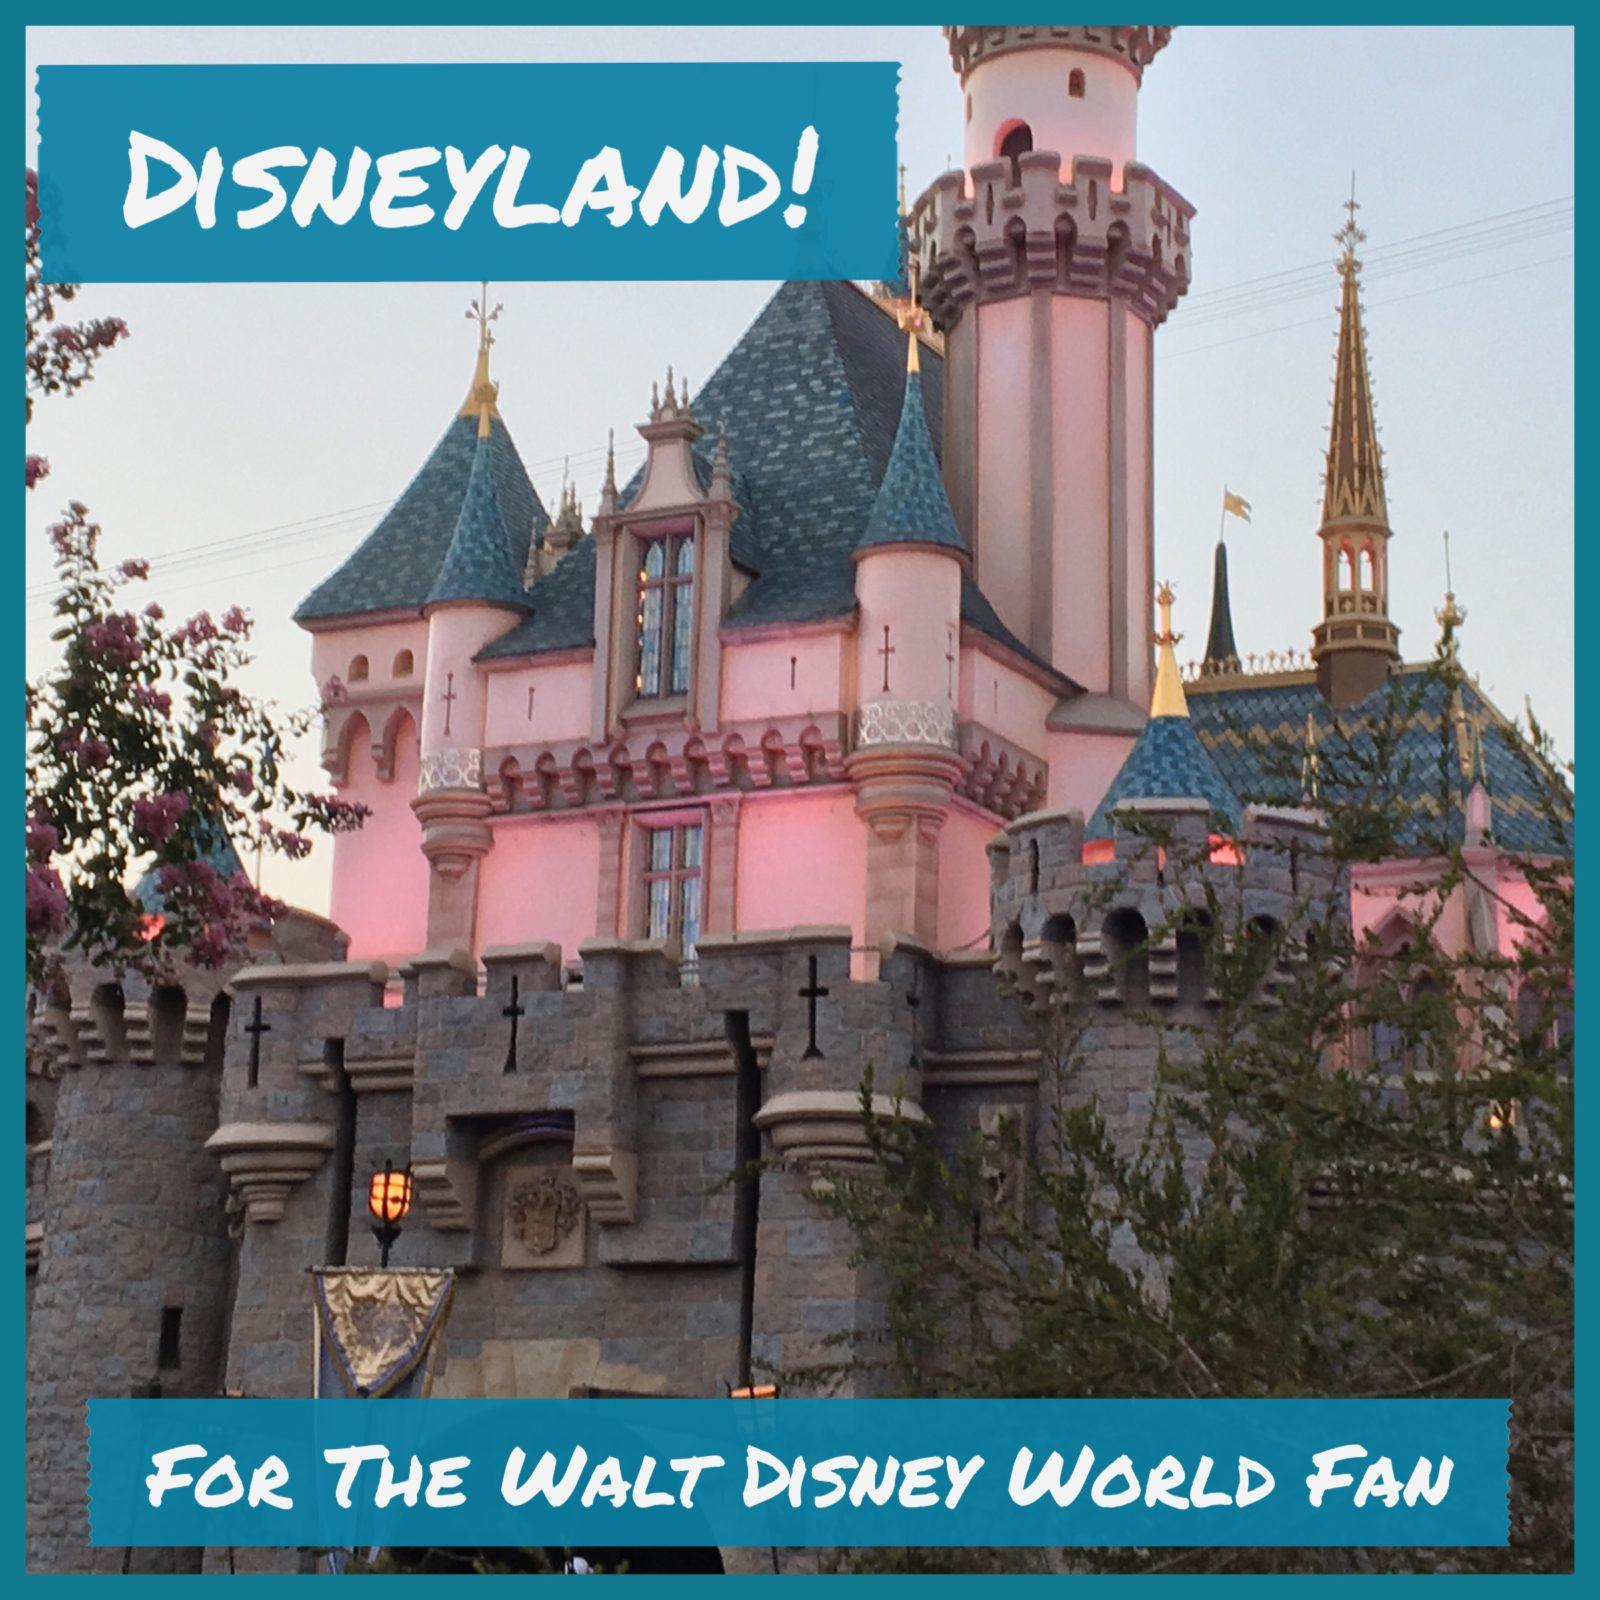 Disneyland for the Walt Disney World Fan